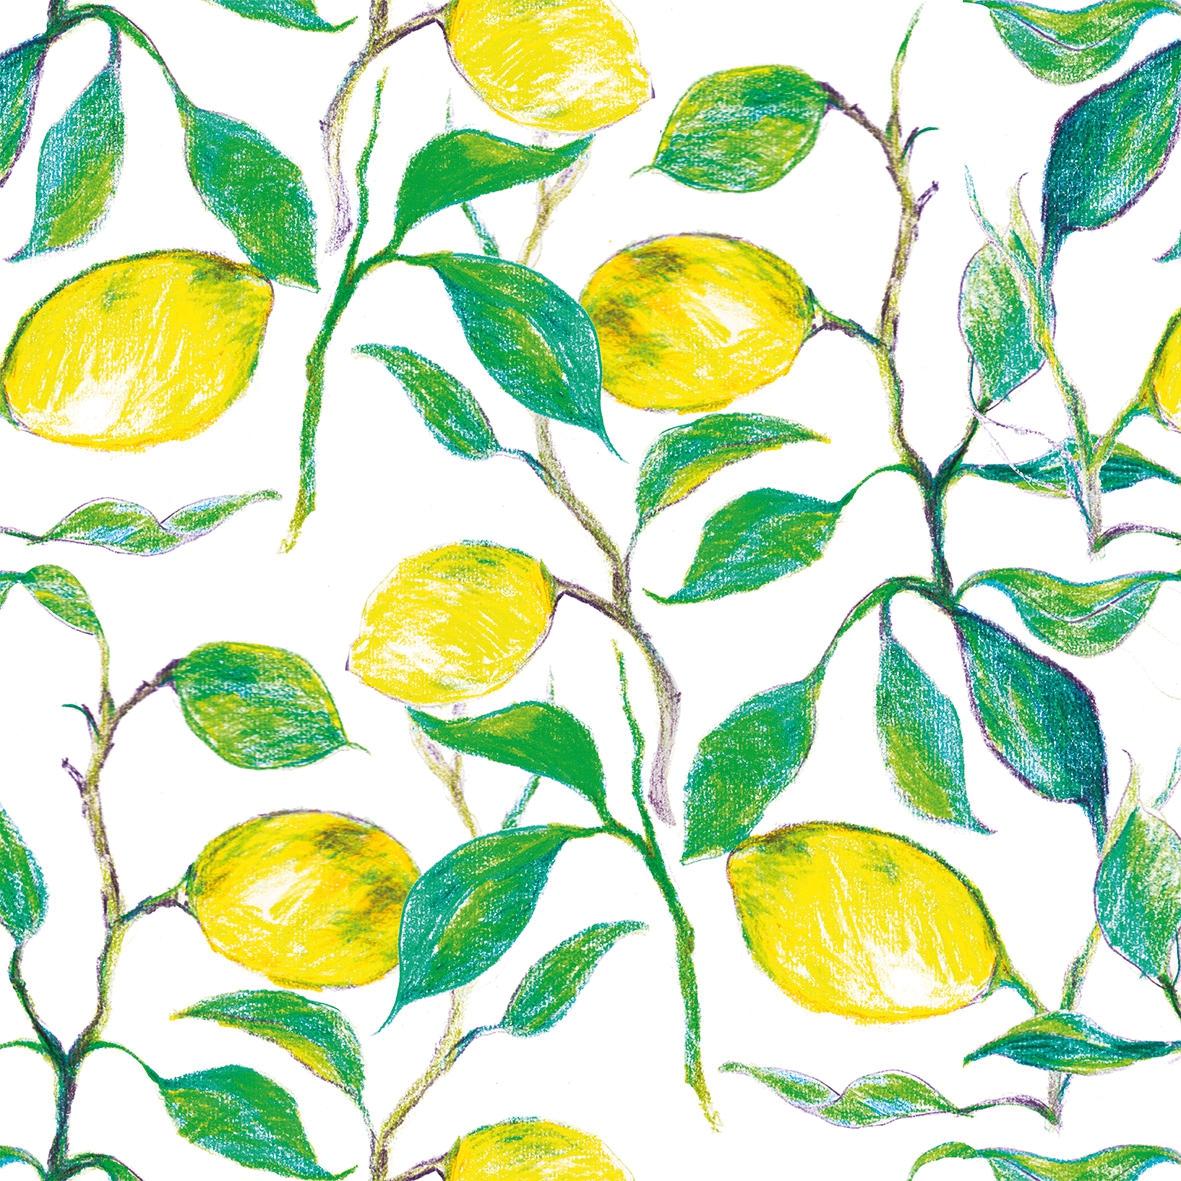 Servilletas 33x33 cm - Beautiful Lemons 33x33 cm